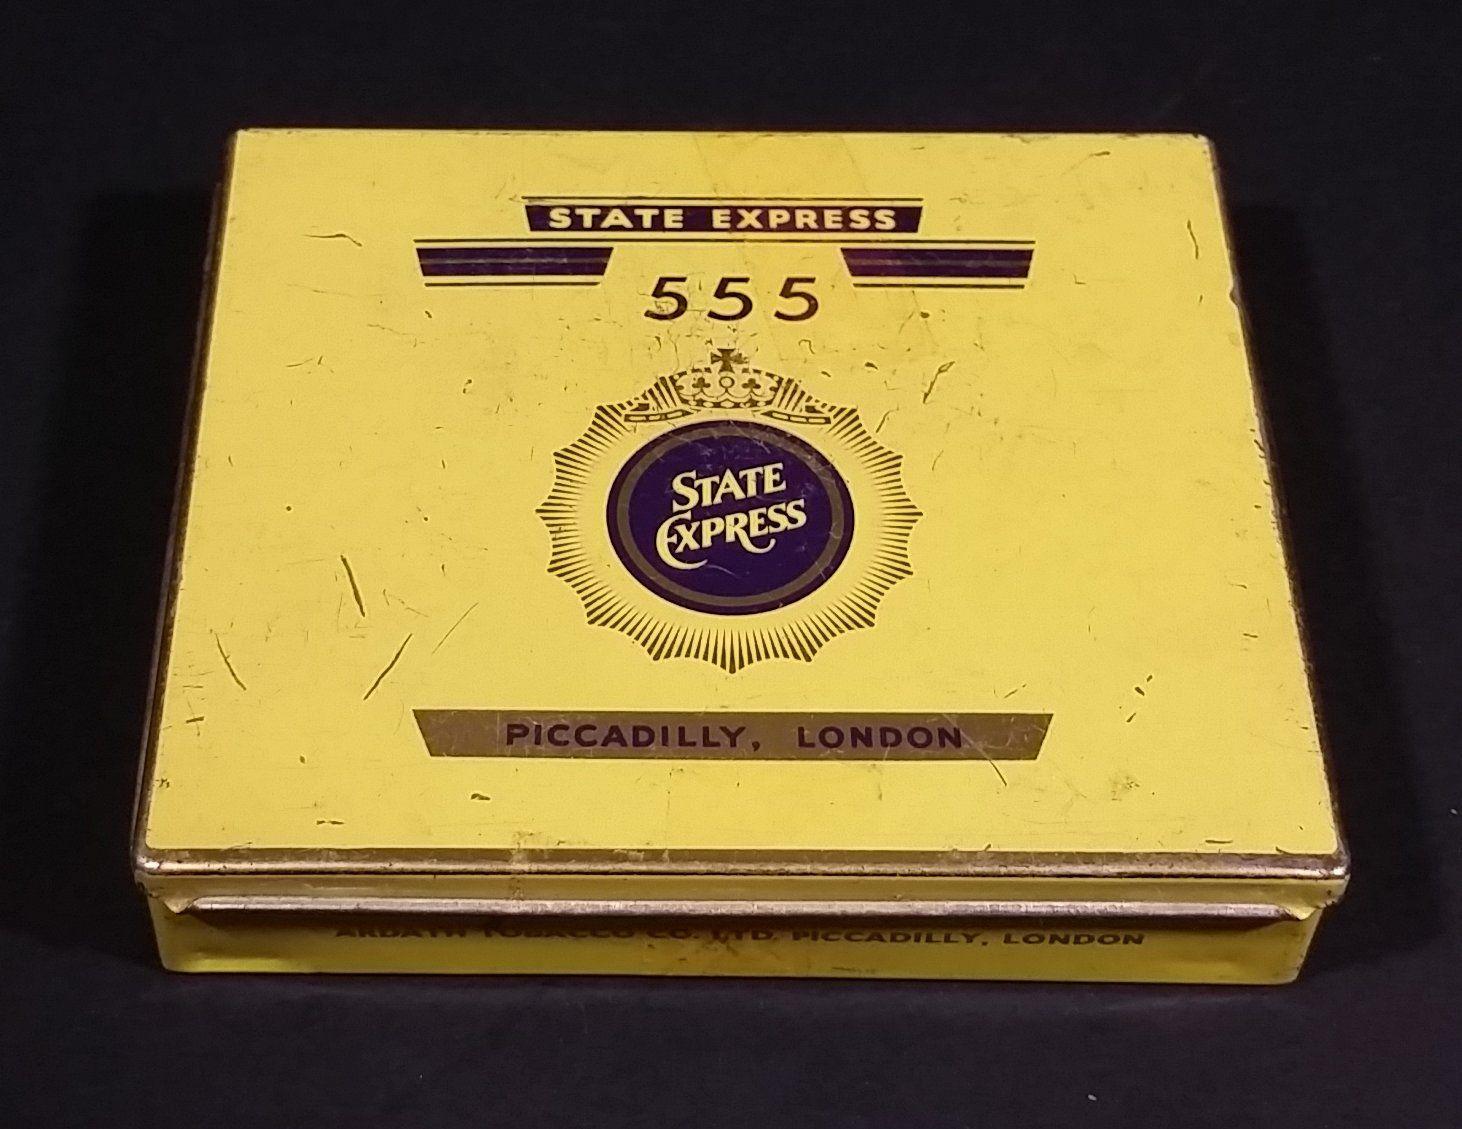 Cartons of cigarettes Marlboro online Australia